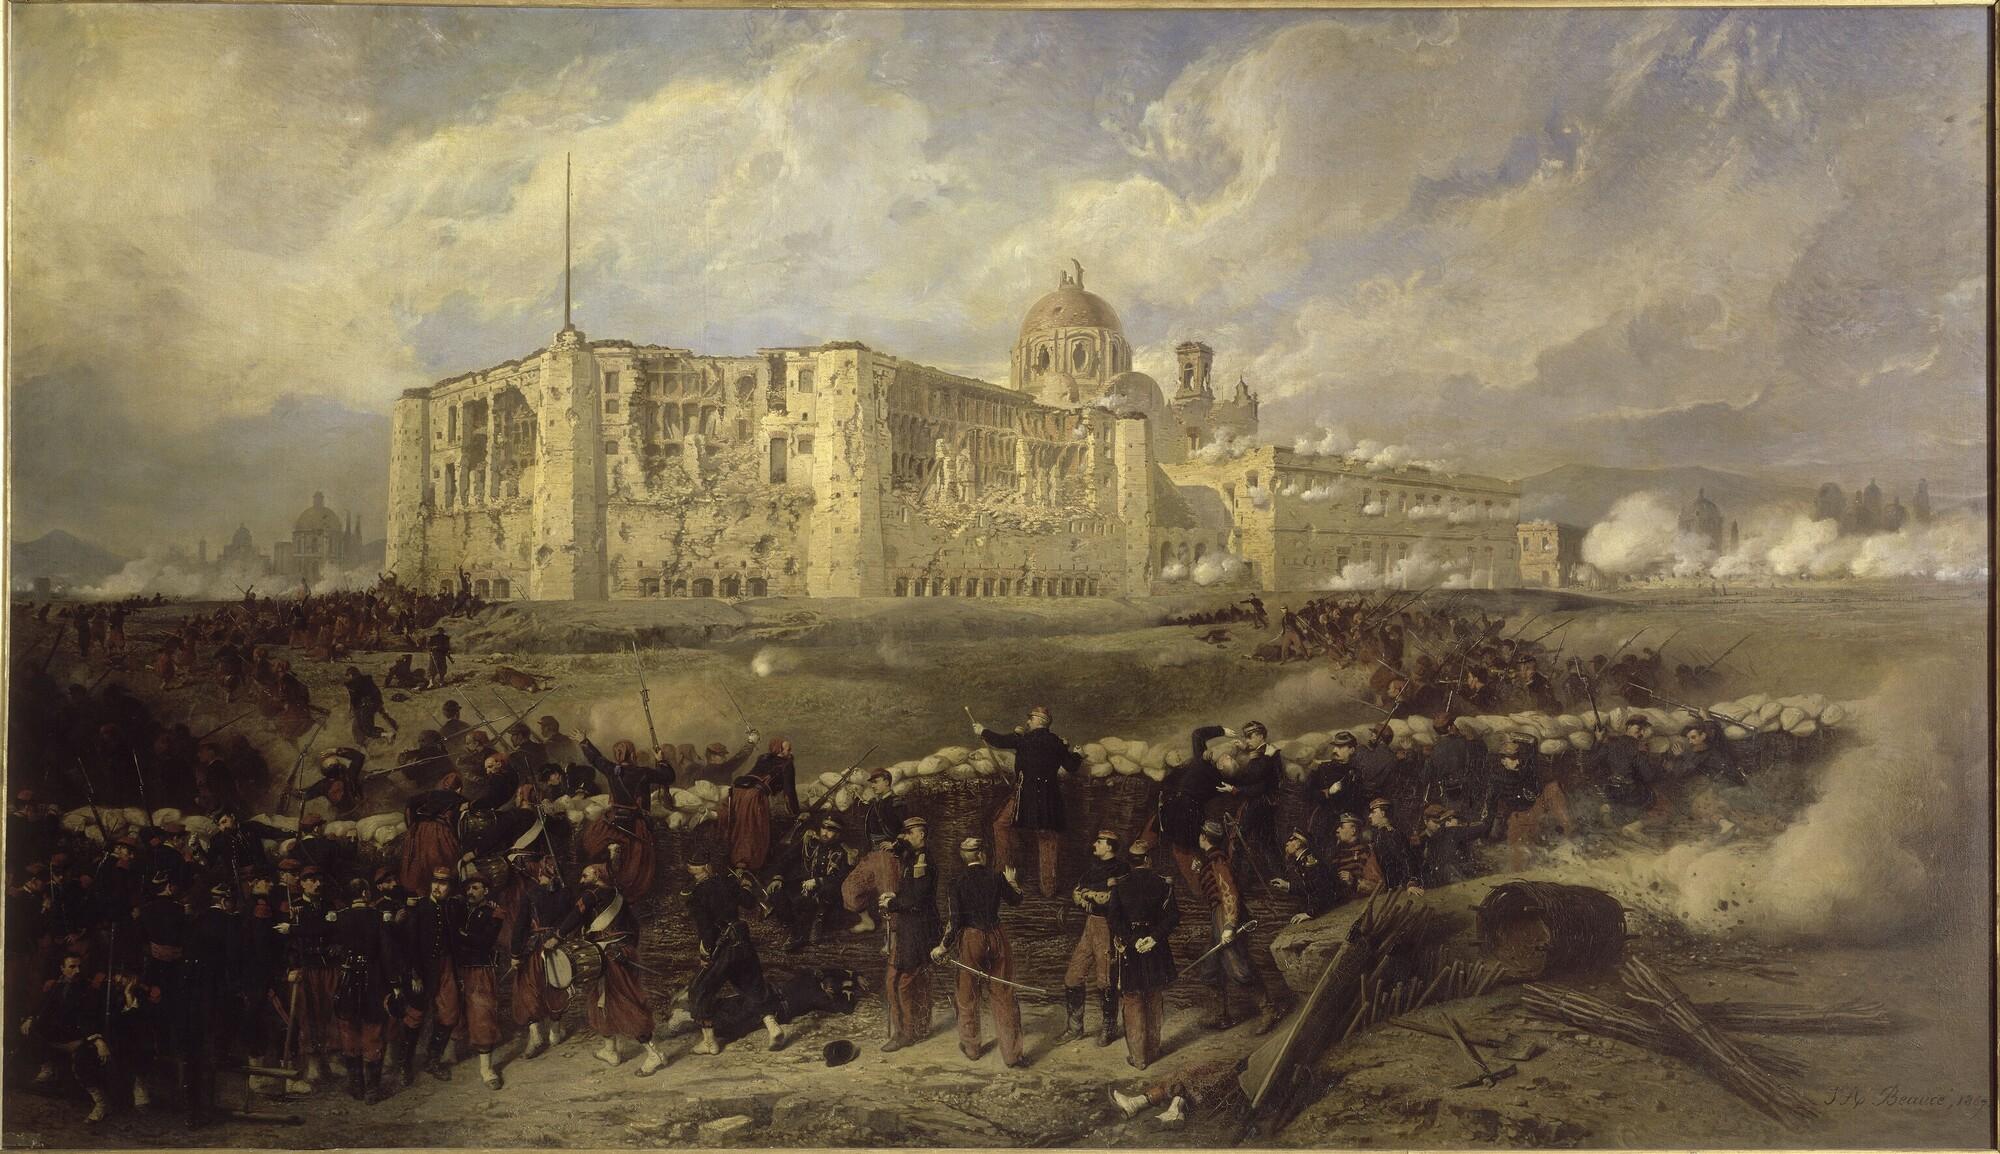 Siège de Puebla, prise du fort San Xavier, 29 mars 1863